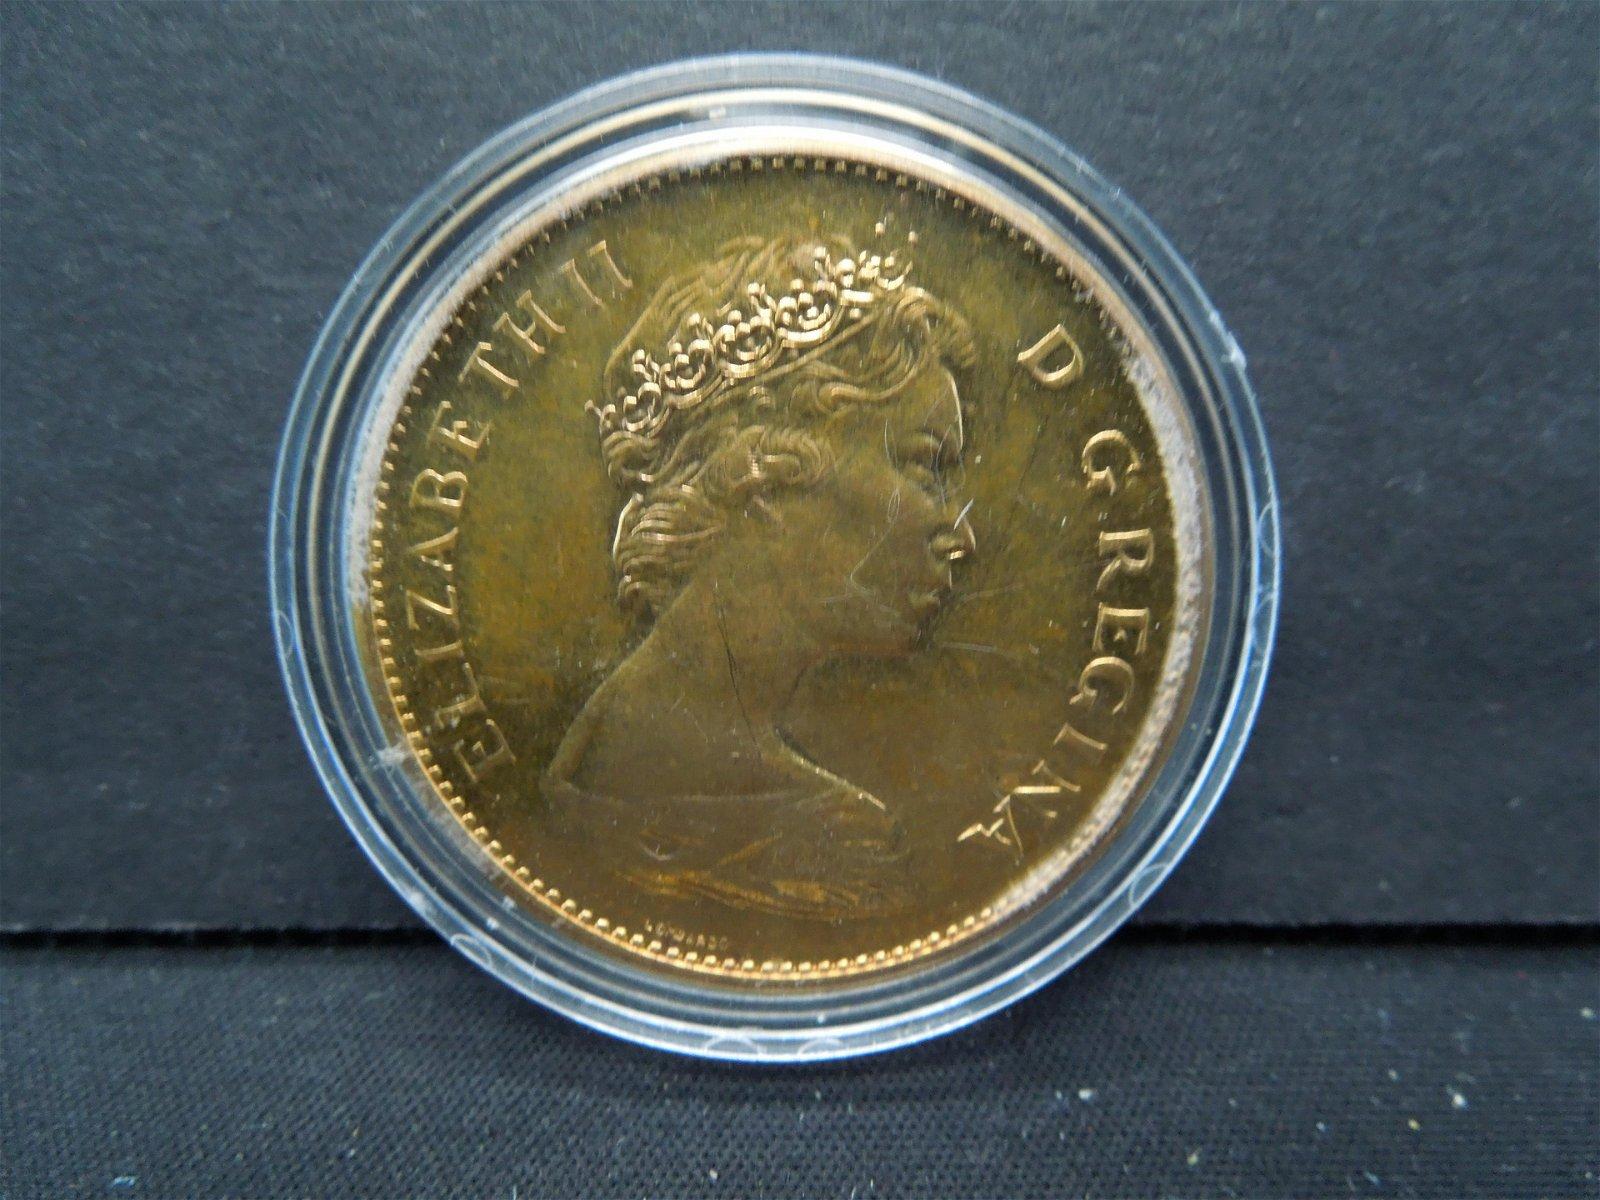 1967 Canada Twenty Dollar Gold Coin